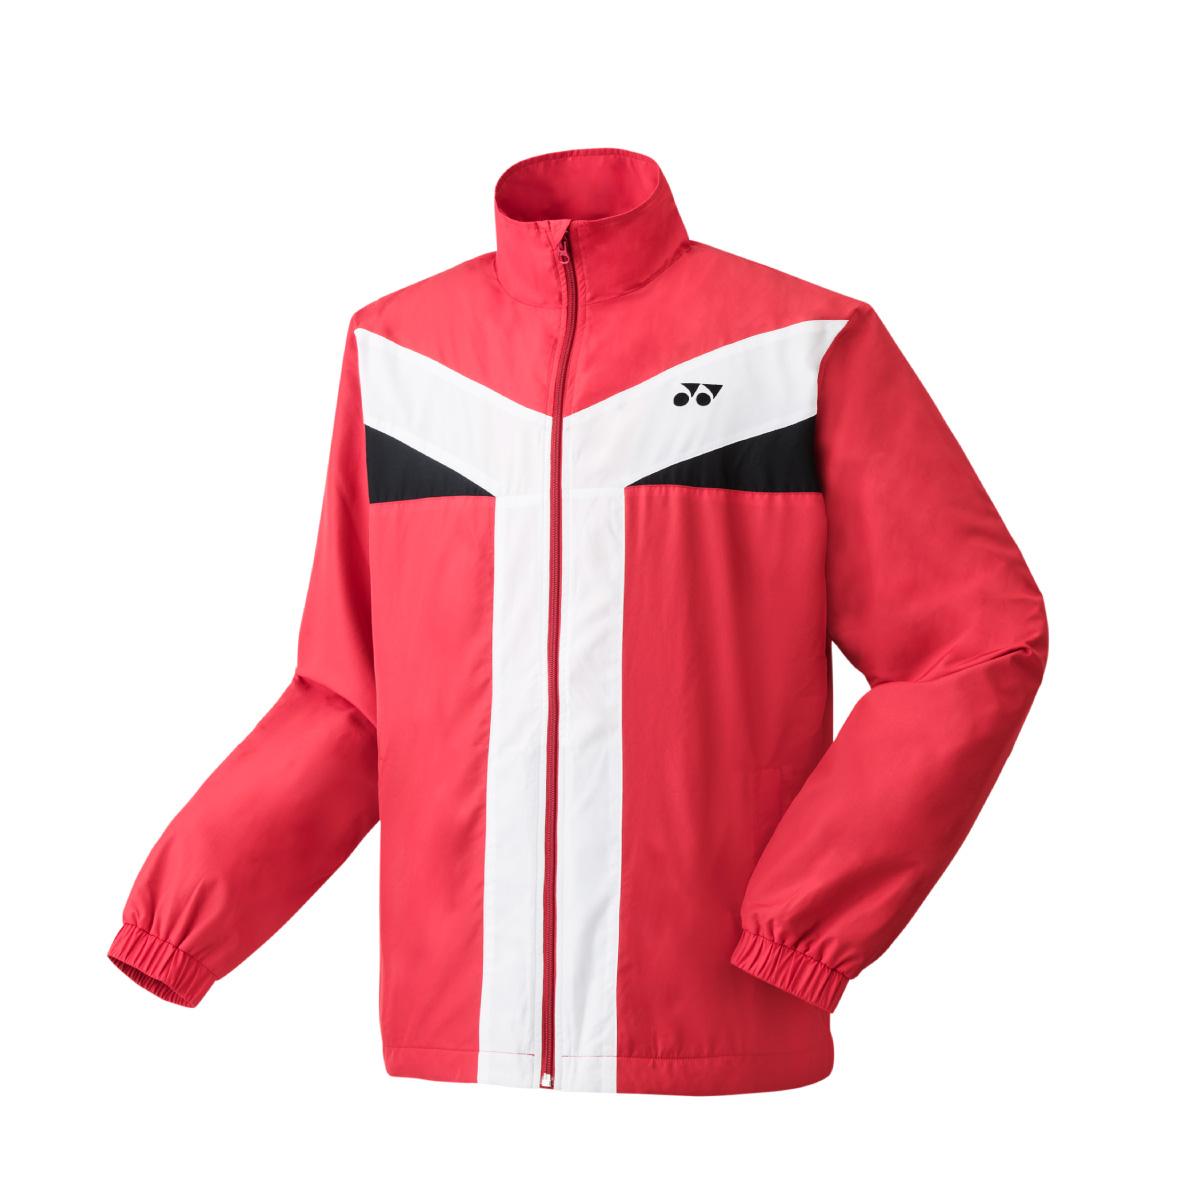 YONEX - Men's Warm-up Jacket, Club Team #YM0020Detailbild - 3